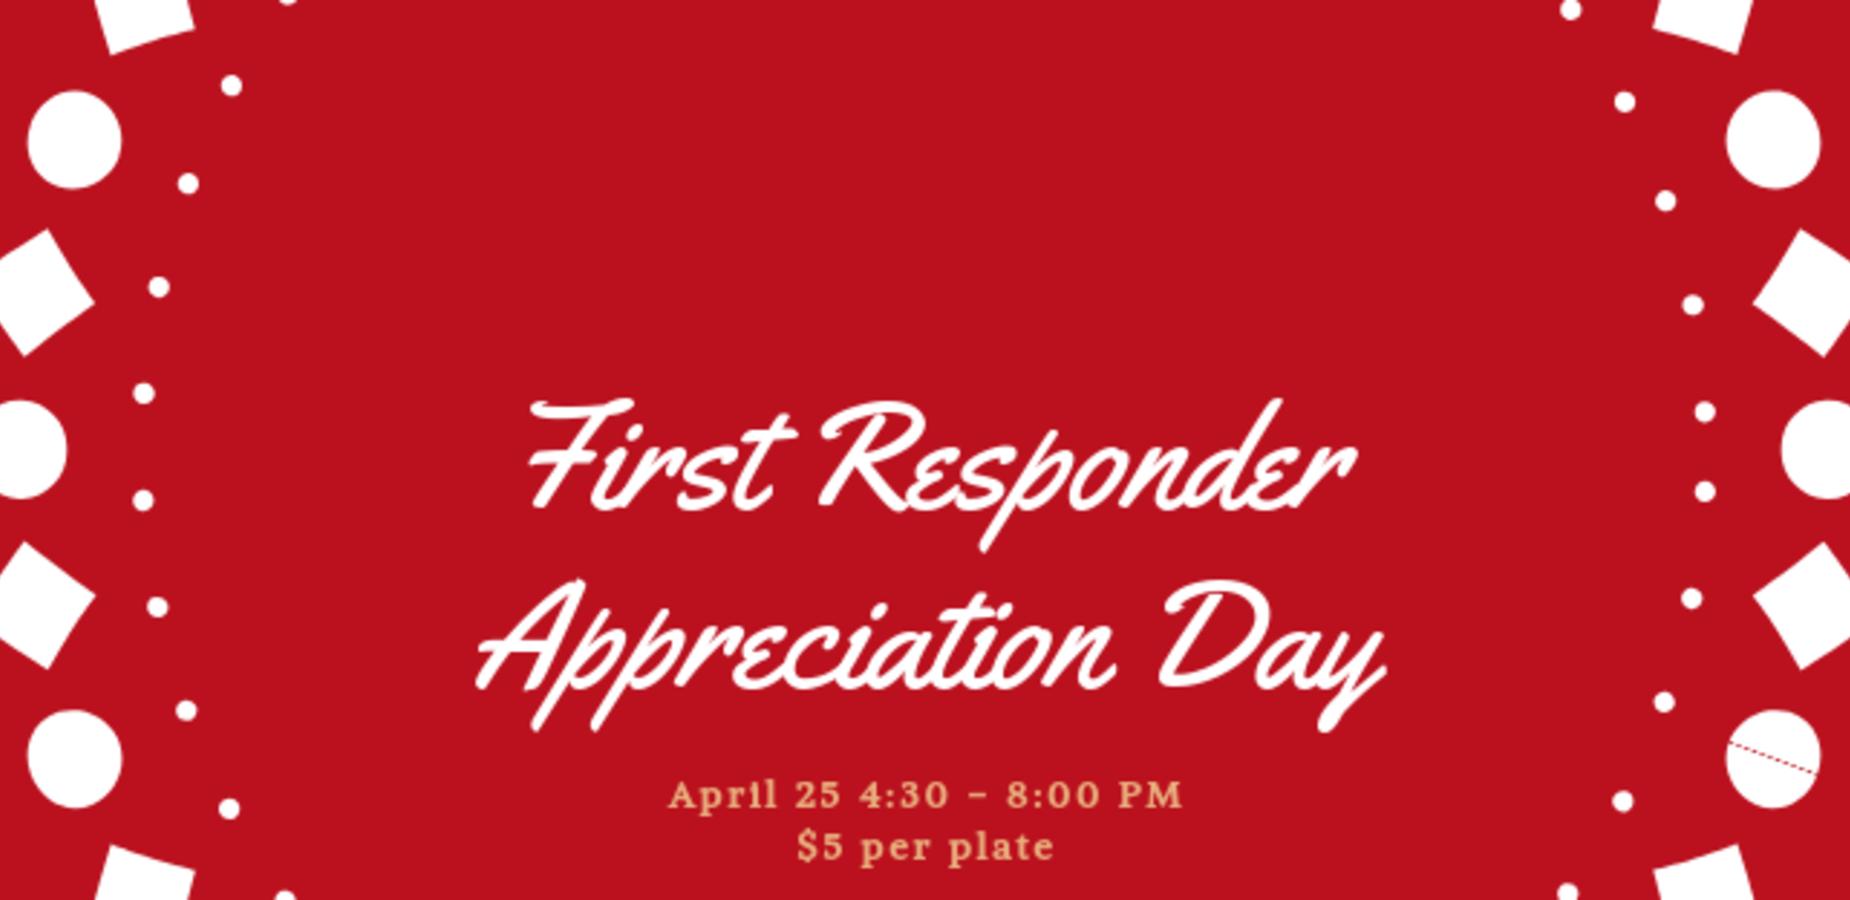 First Responder Appreciation Day Fundraiser April 25th 4:30-8:00 PM